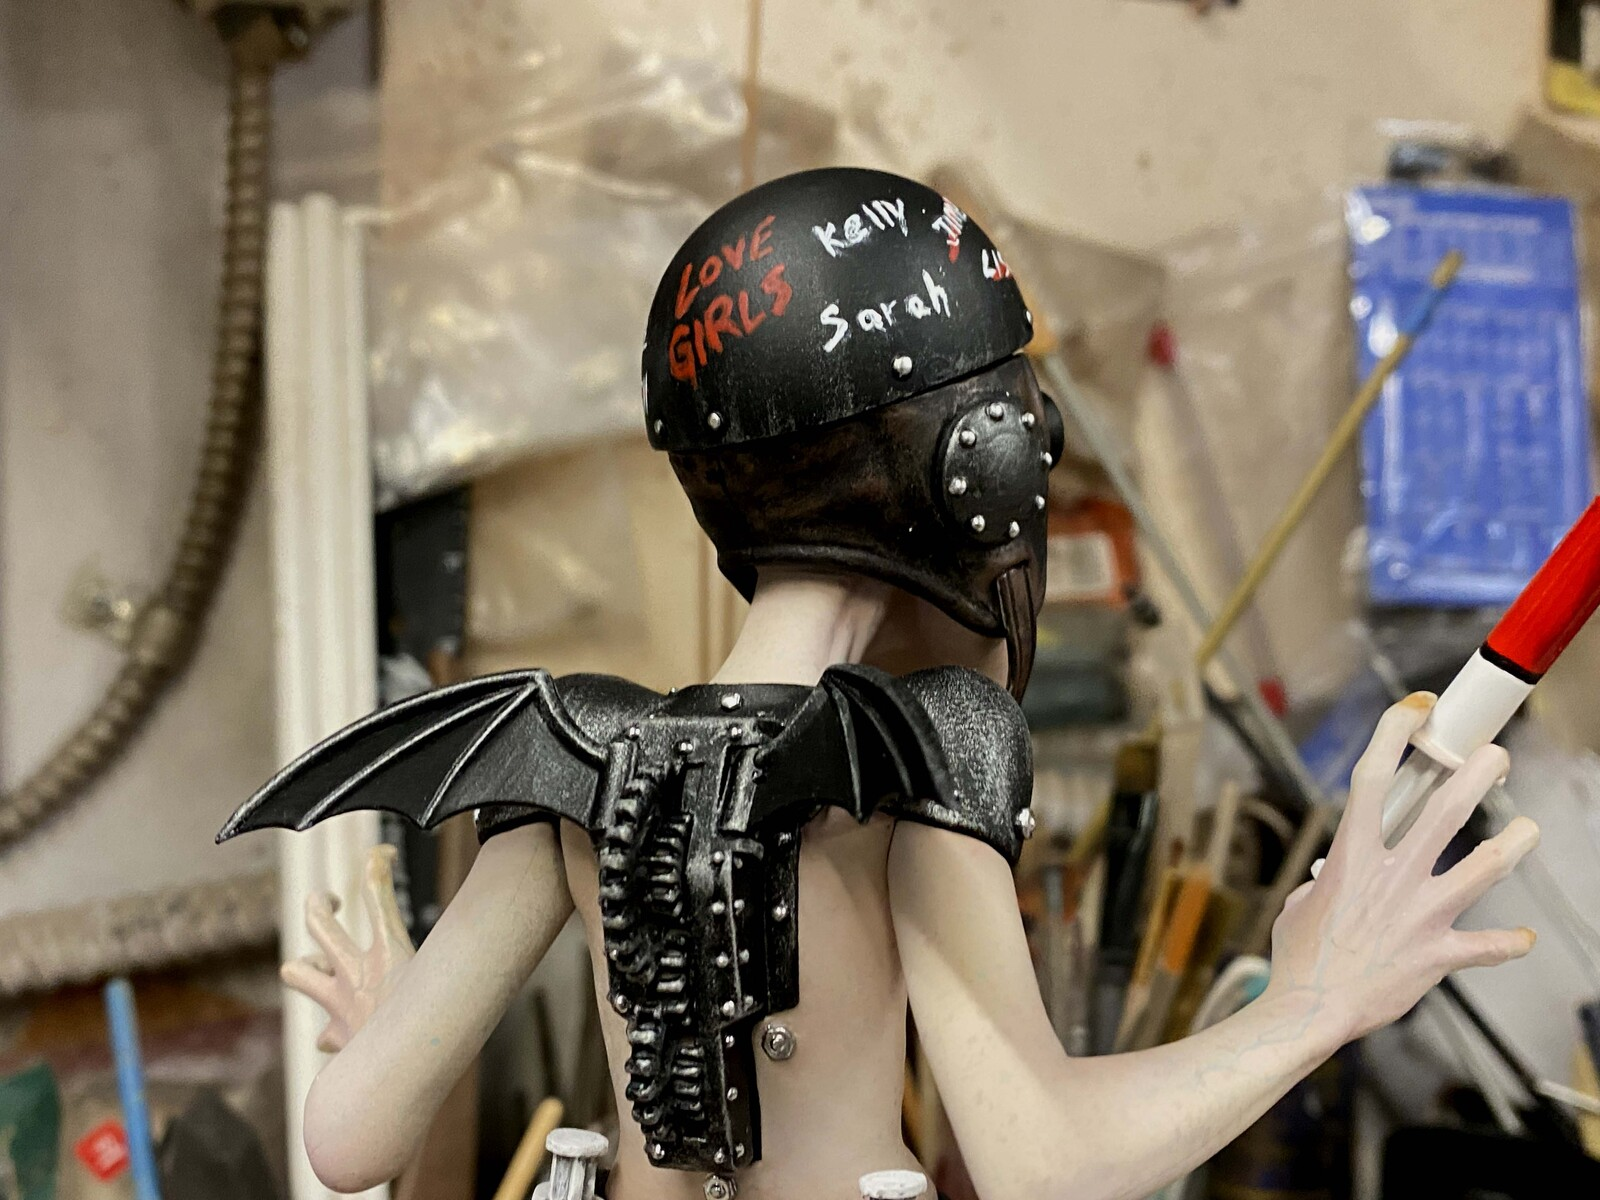 Blood Collector Nosferatu Art Statue  https://www.solidart.club/